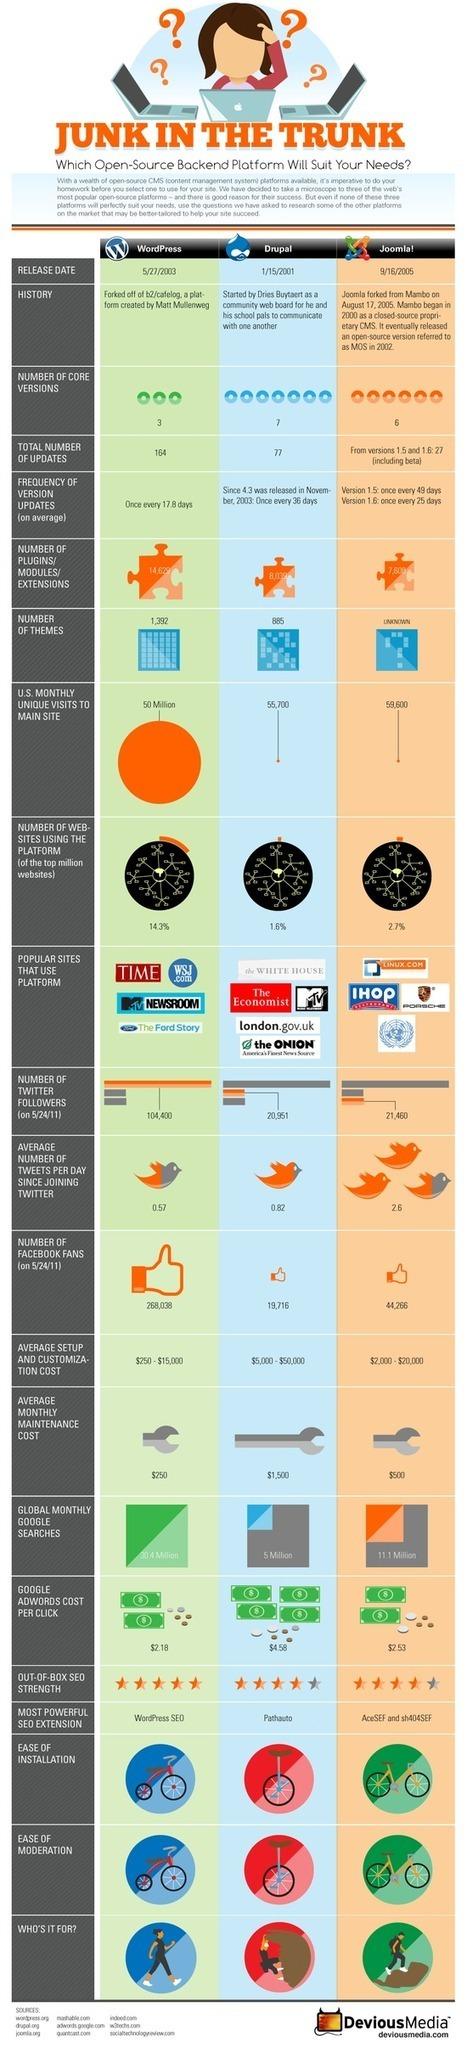 WordPress vs Joomla vs Drupal - CMS Popularity War | BI, Reporting & Dashboard | Scoop.it